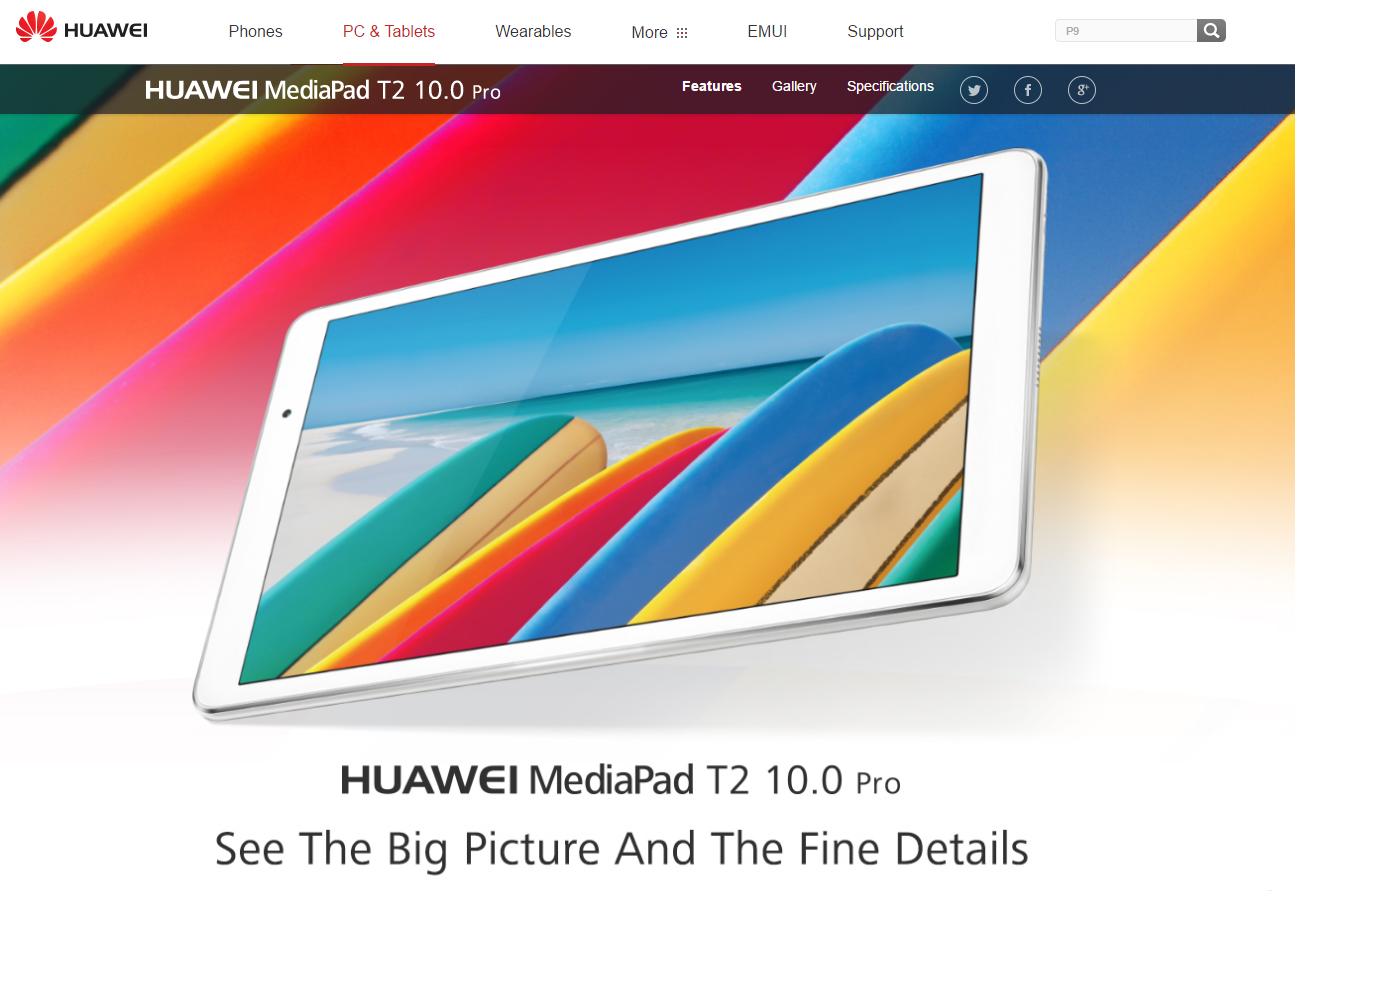 Vorgestellt: Das Huawei MediaPad T2 Pro